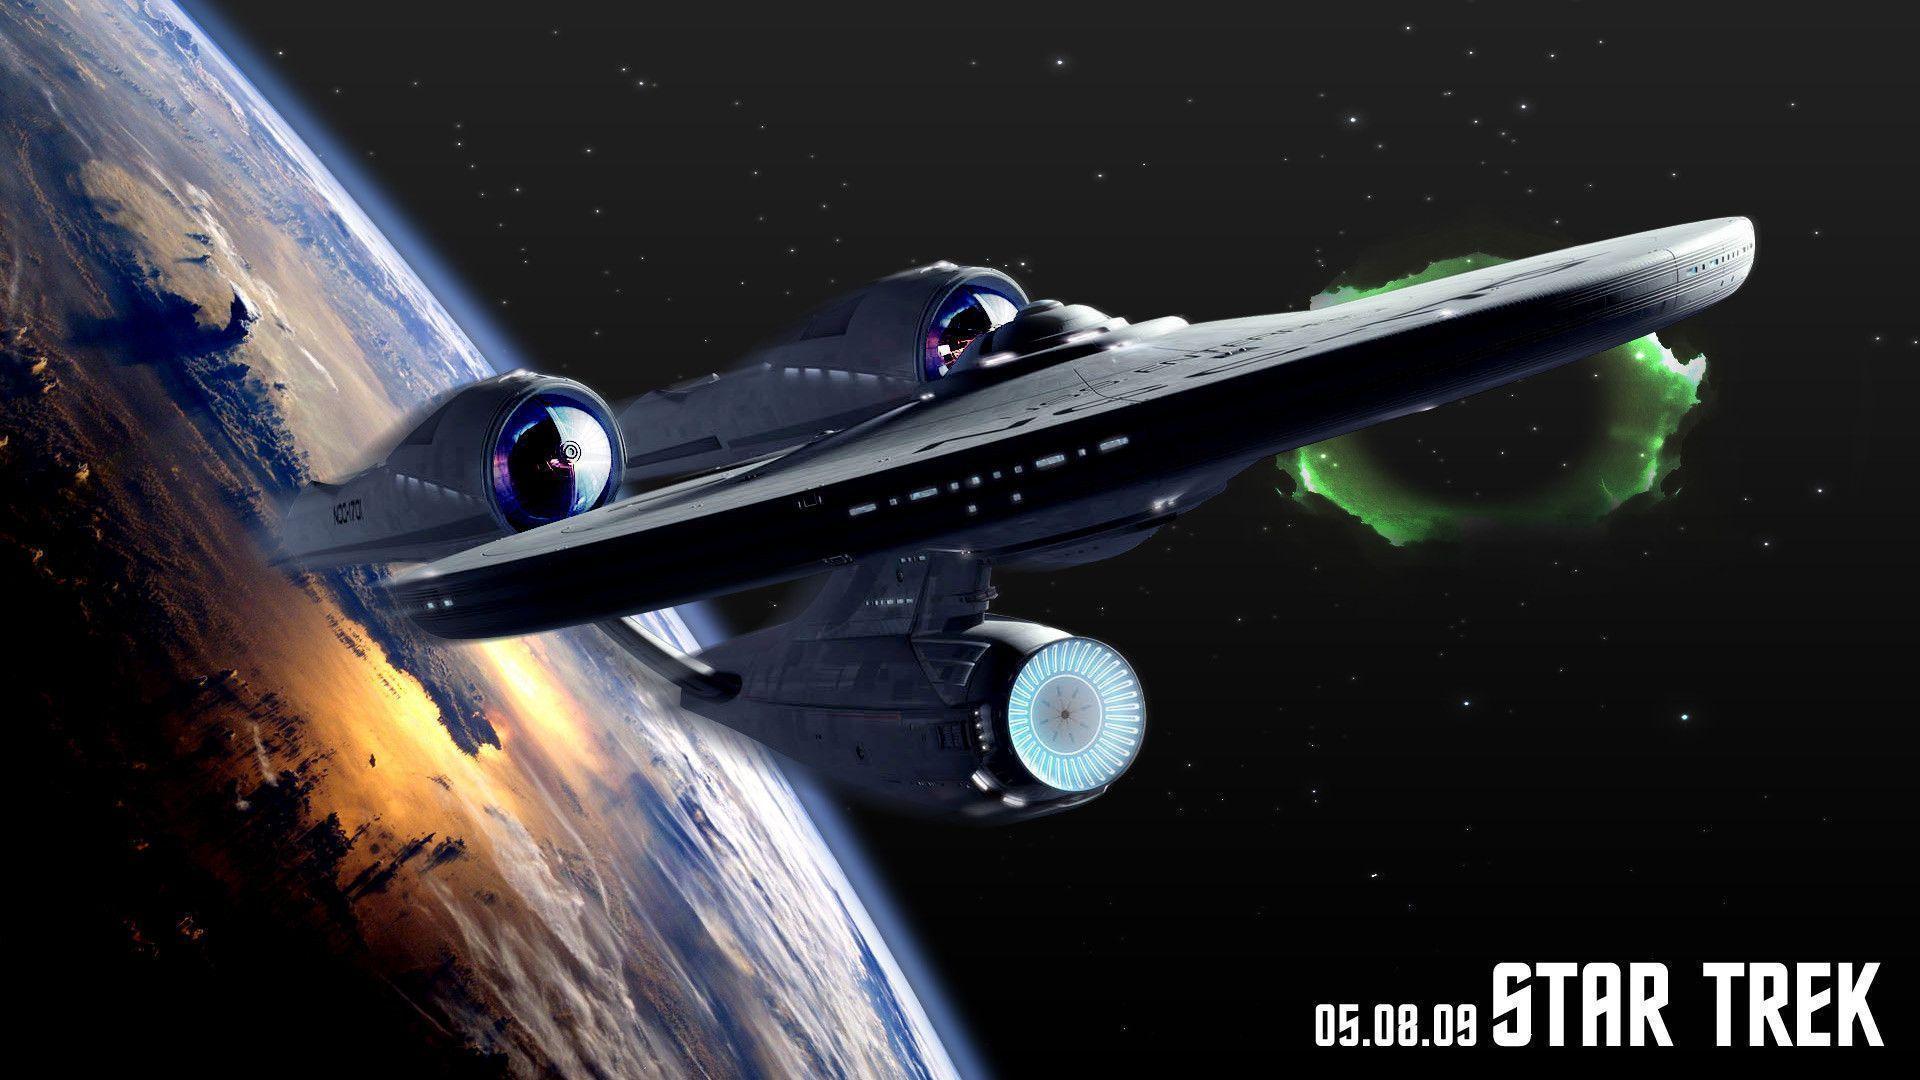 Star Trek Wallpapers 1920x1080